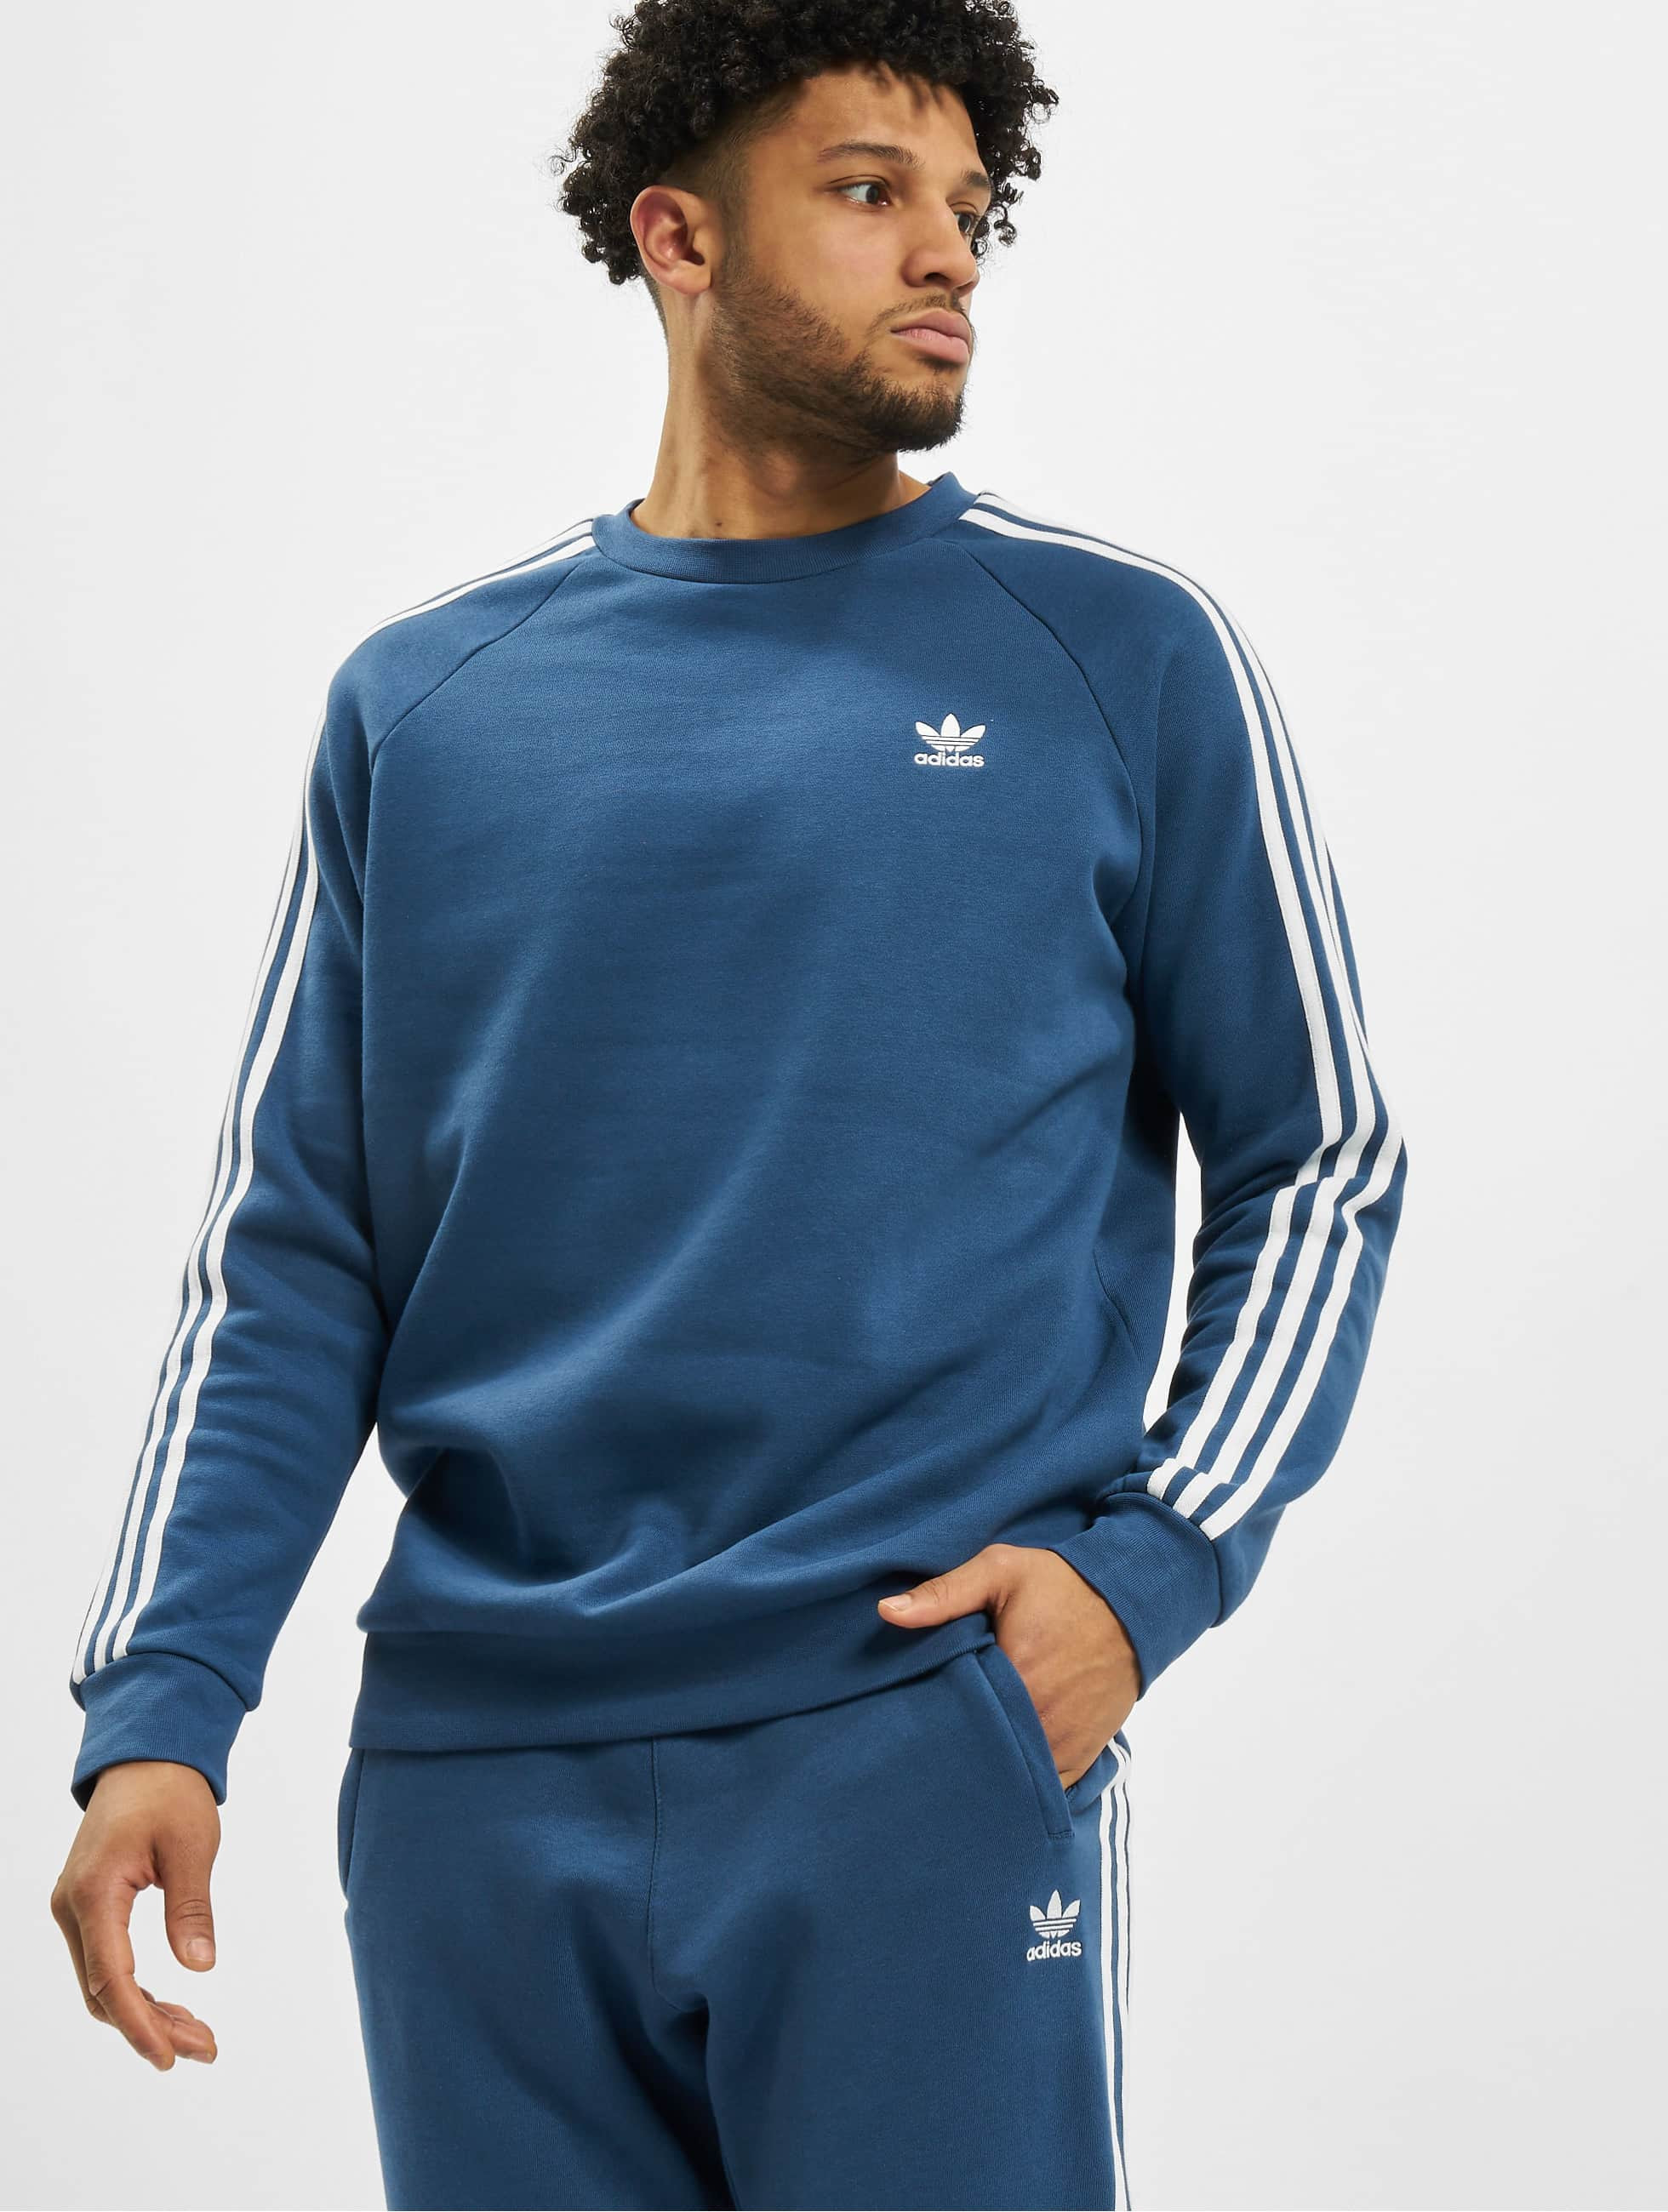 Promo SweaT Shirt Adidas Adidas 3 Stripes Homme Bleu Marine